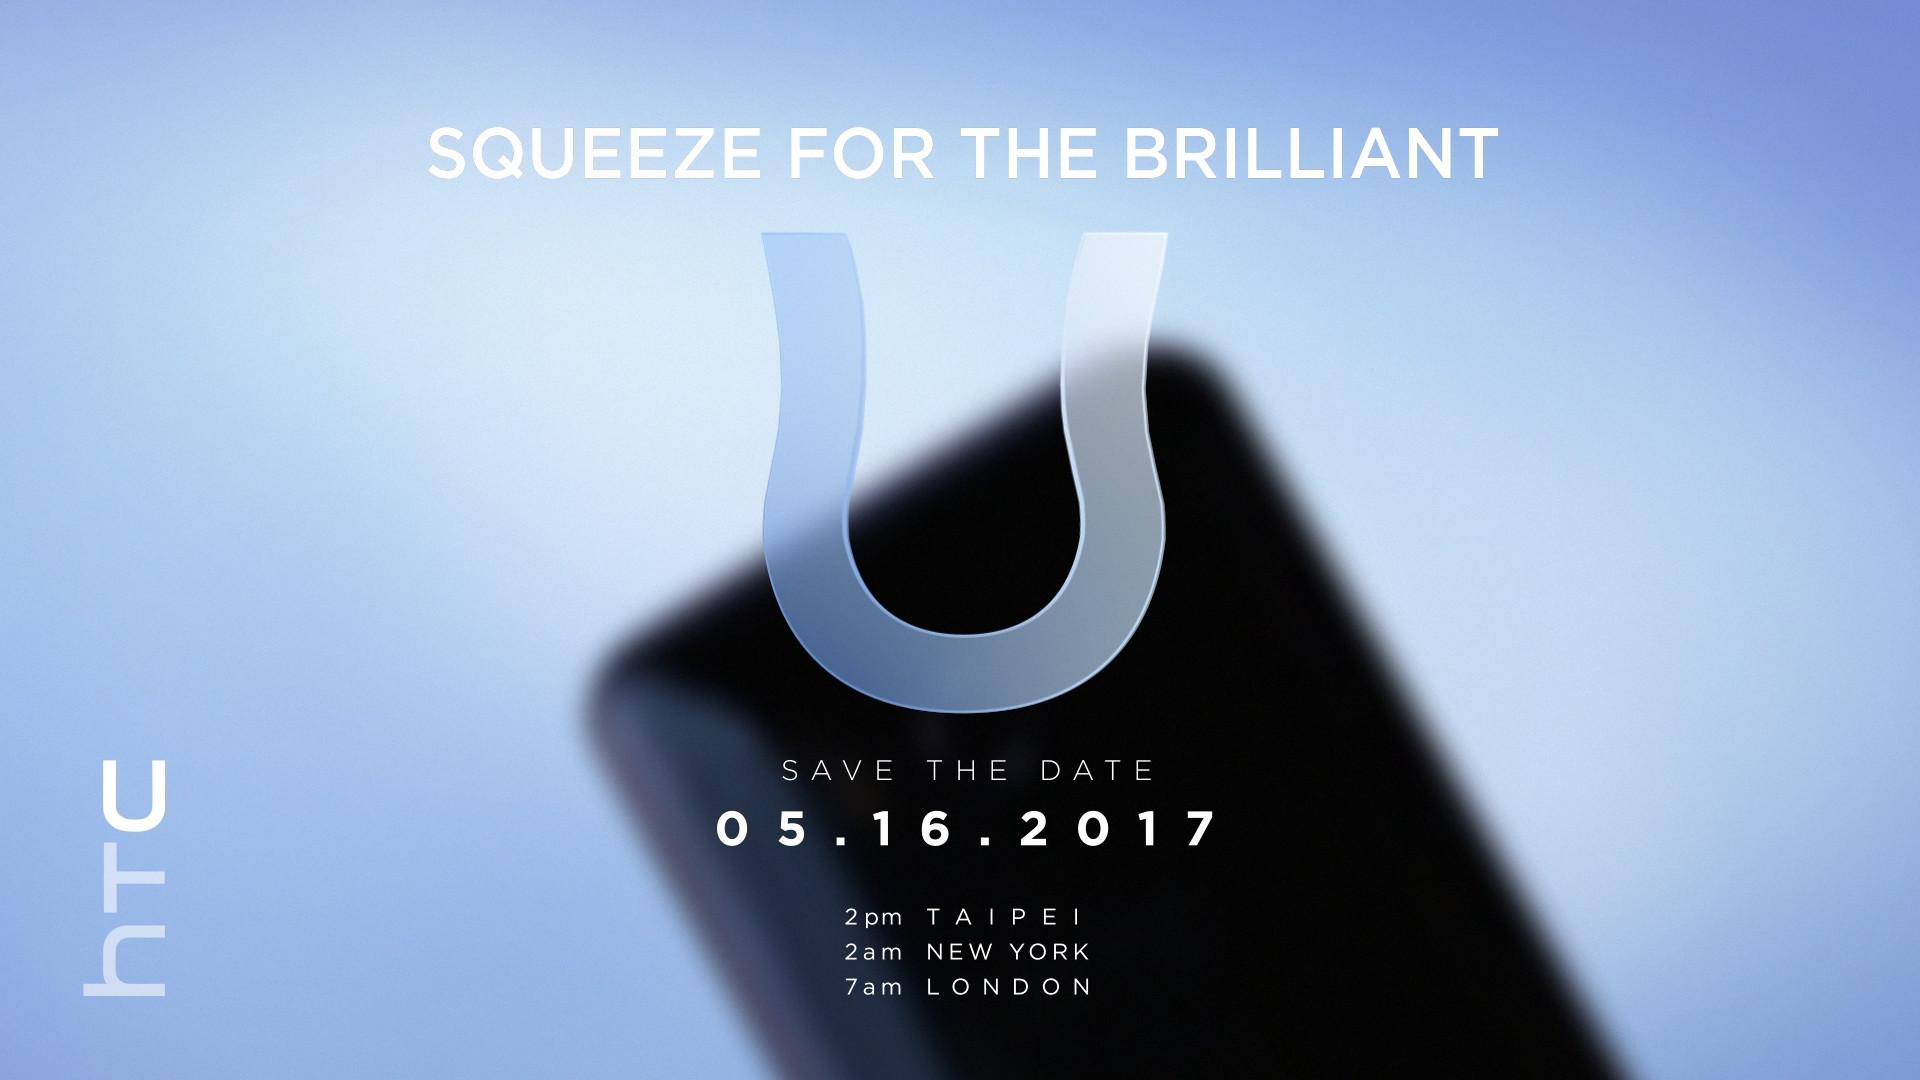 HTC U确定5月16日公布:2020年最大端HTC手机上就它了?